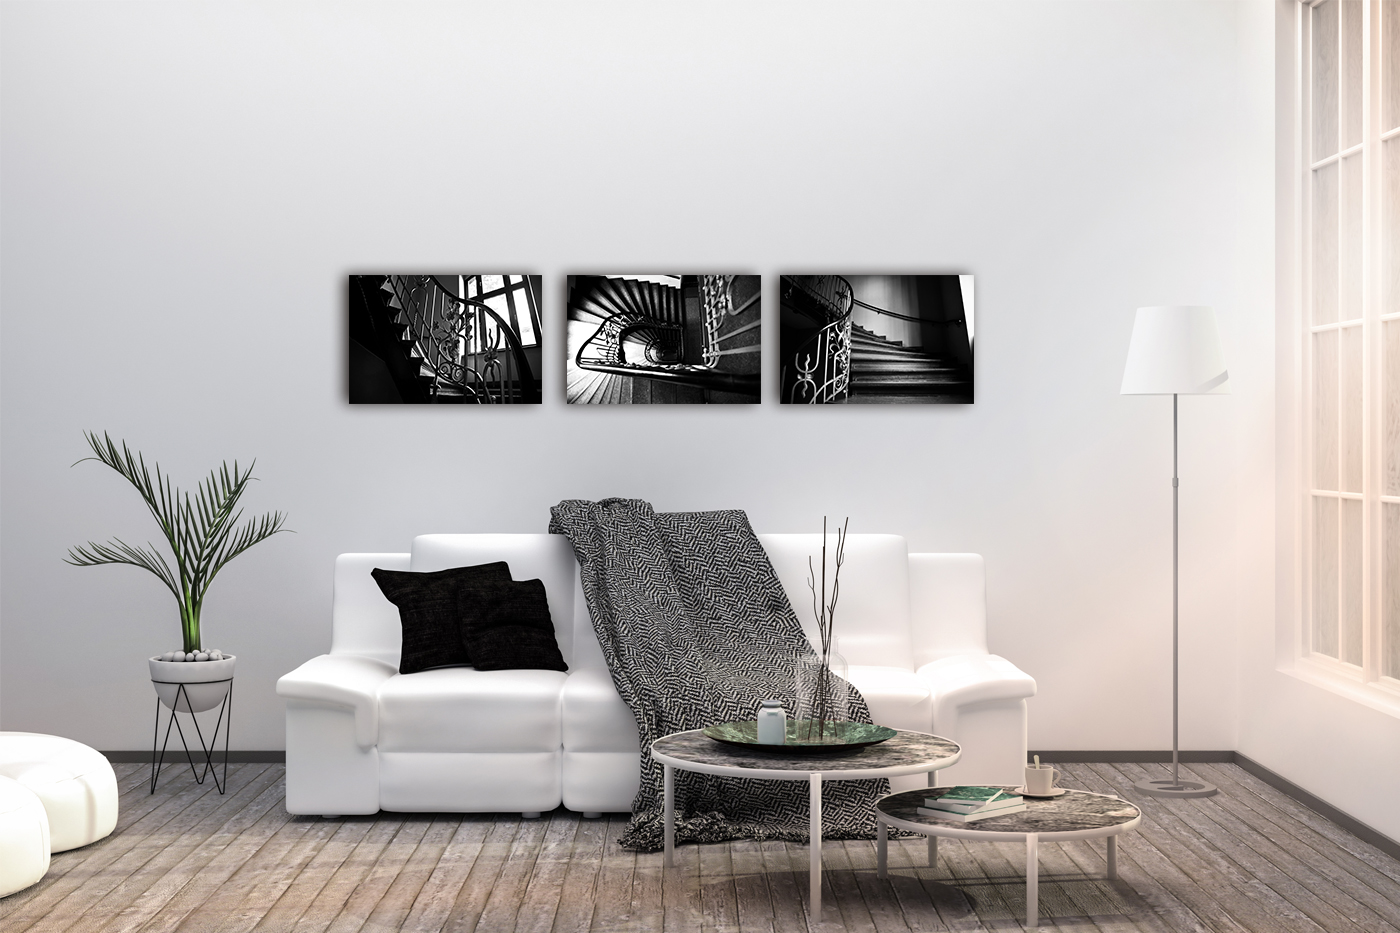 Stairs photo, architecture photo, photo set example image 6